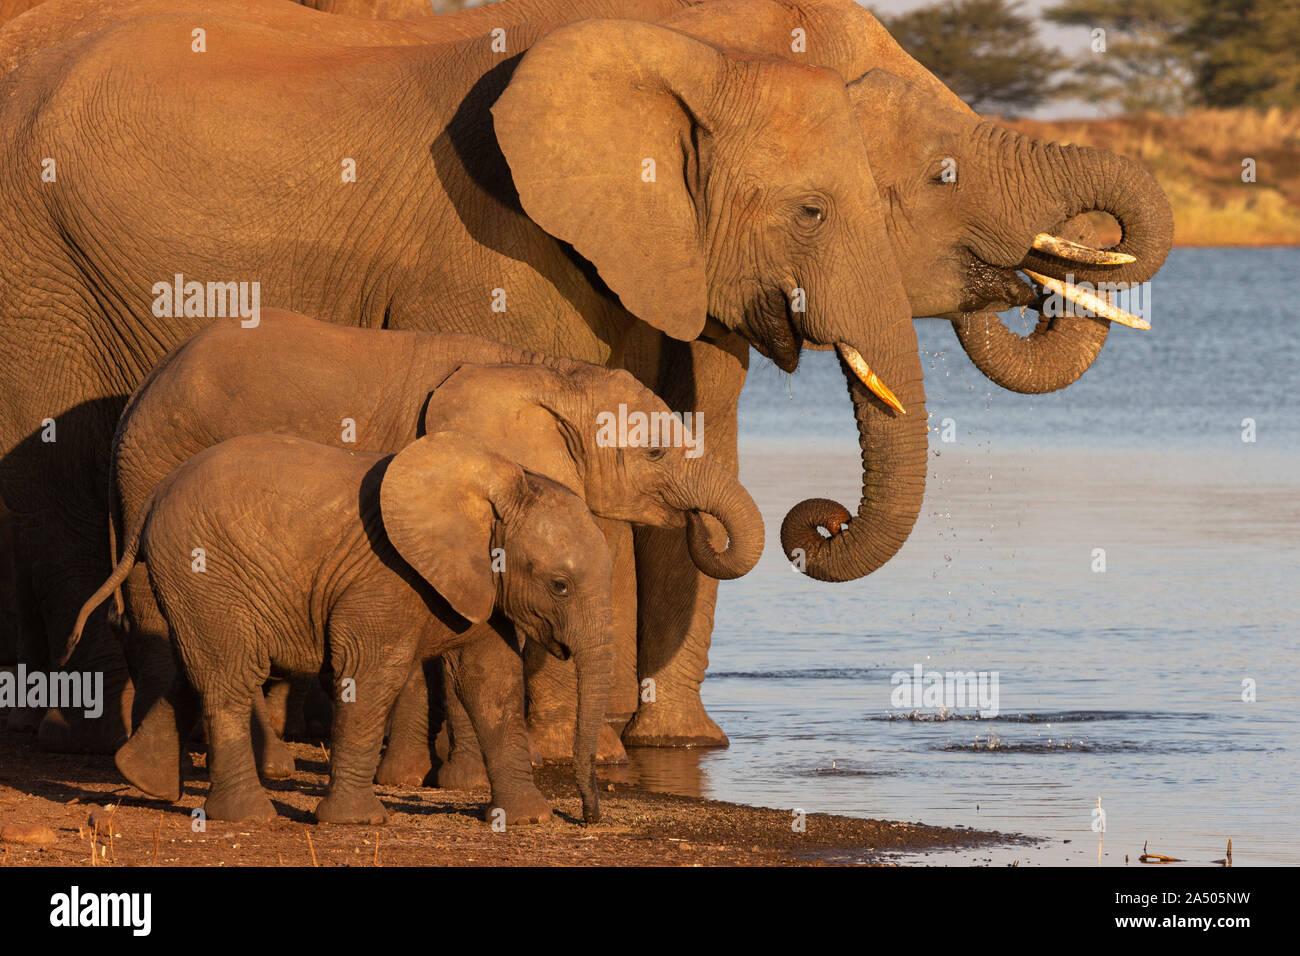 African elephants (Loxodonta africana) drinking, Zimanga game reserve, KwaZulu-Natal, South Africa Stock Photo